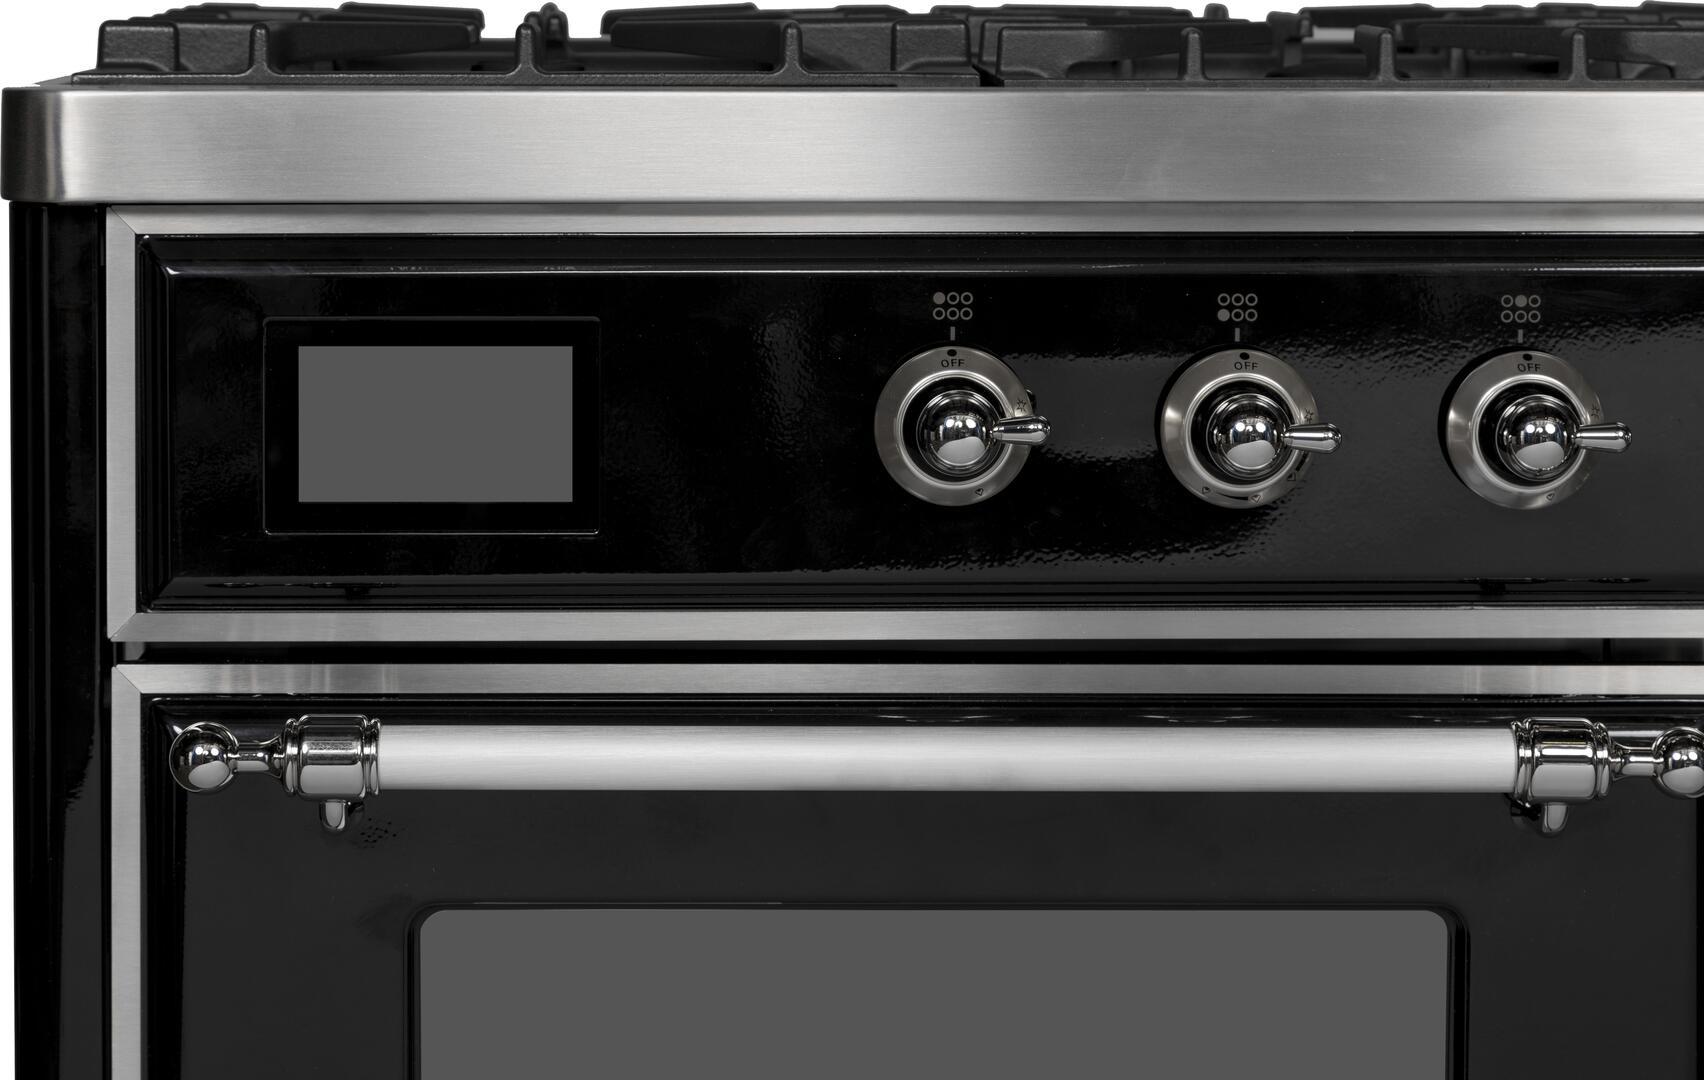 Ilve Majestic II UMD10FDNS3BKCLP Freestanding Dual Fuel Range Black, UMD10FDNS3BKC Close Up Details